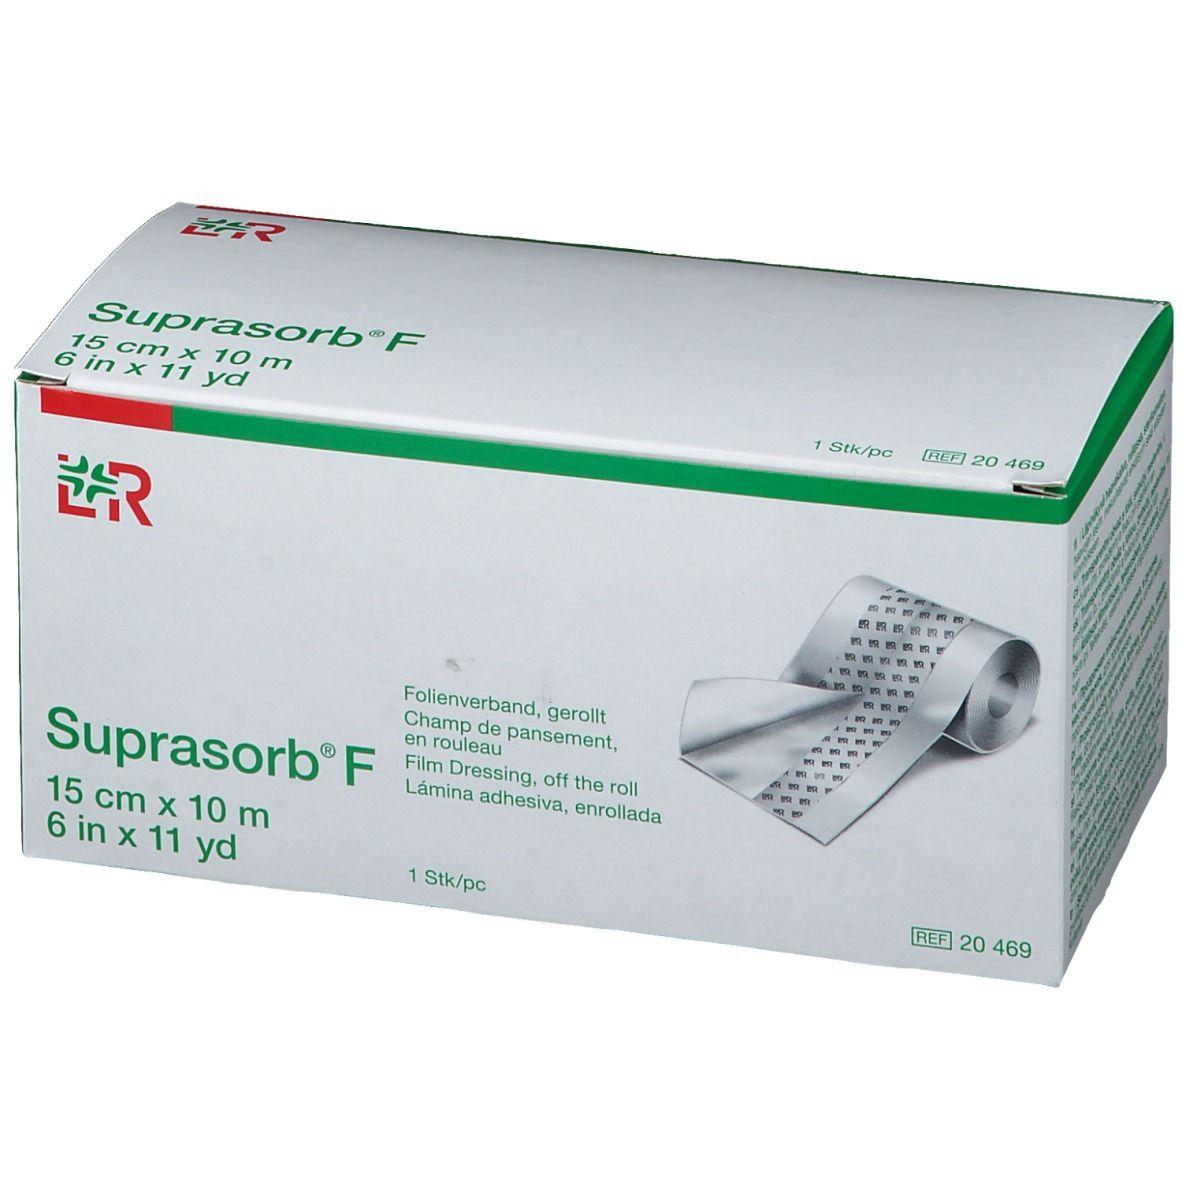 Suprasorb® F 15 cm x 10 m unsteril